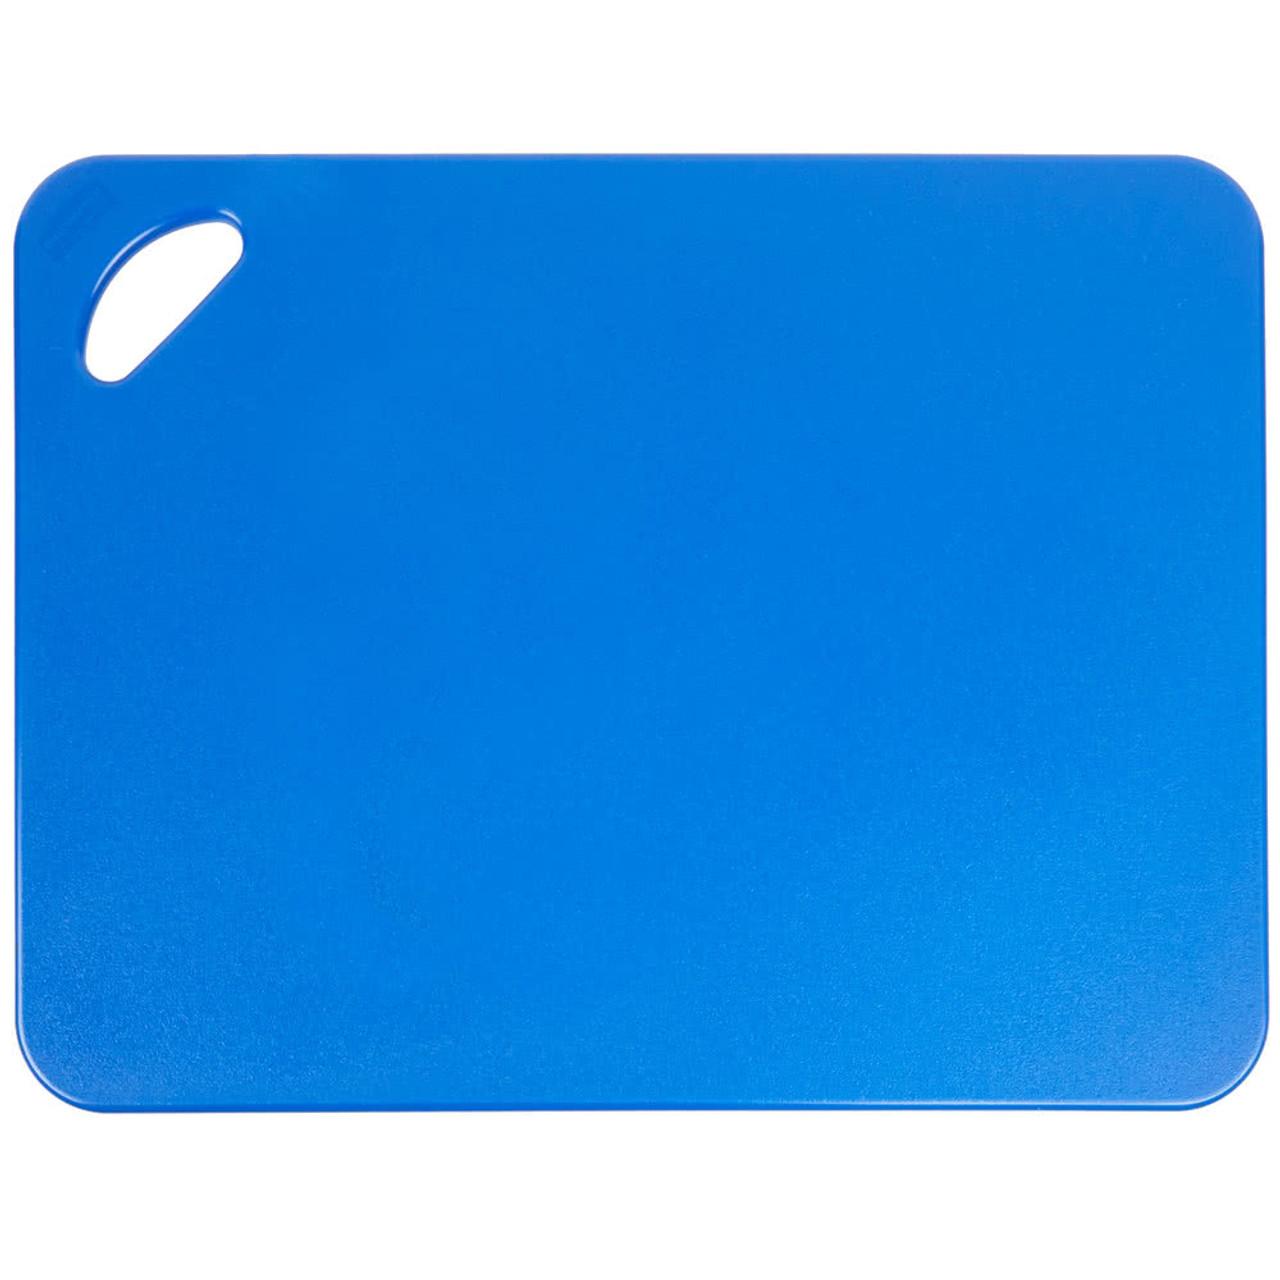 Rubbermaid Cutting Board Blue - 1980410